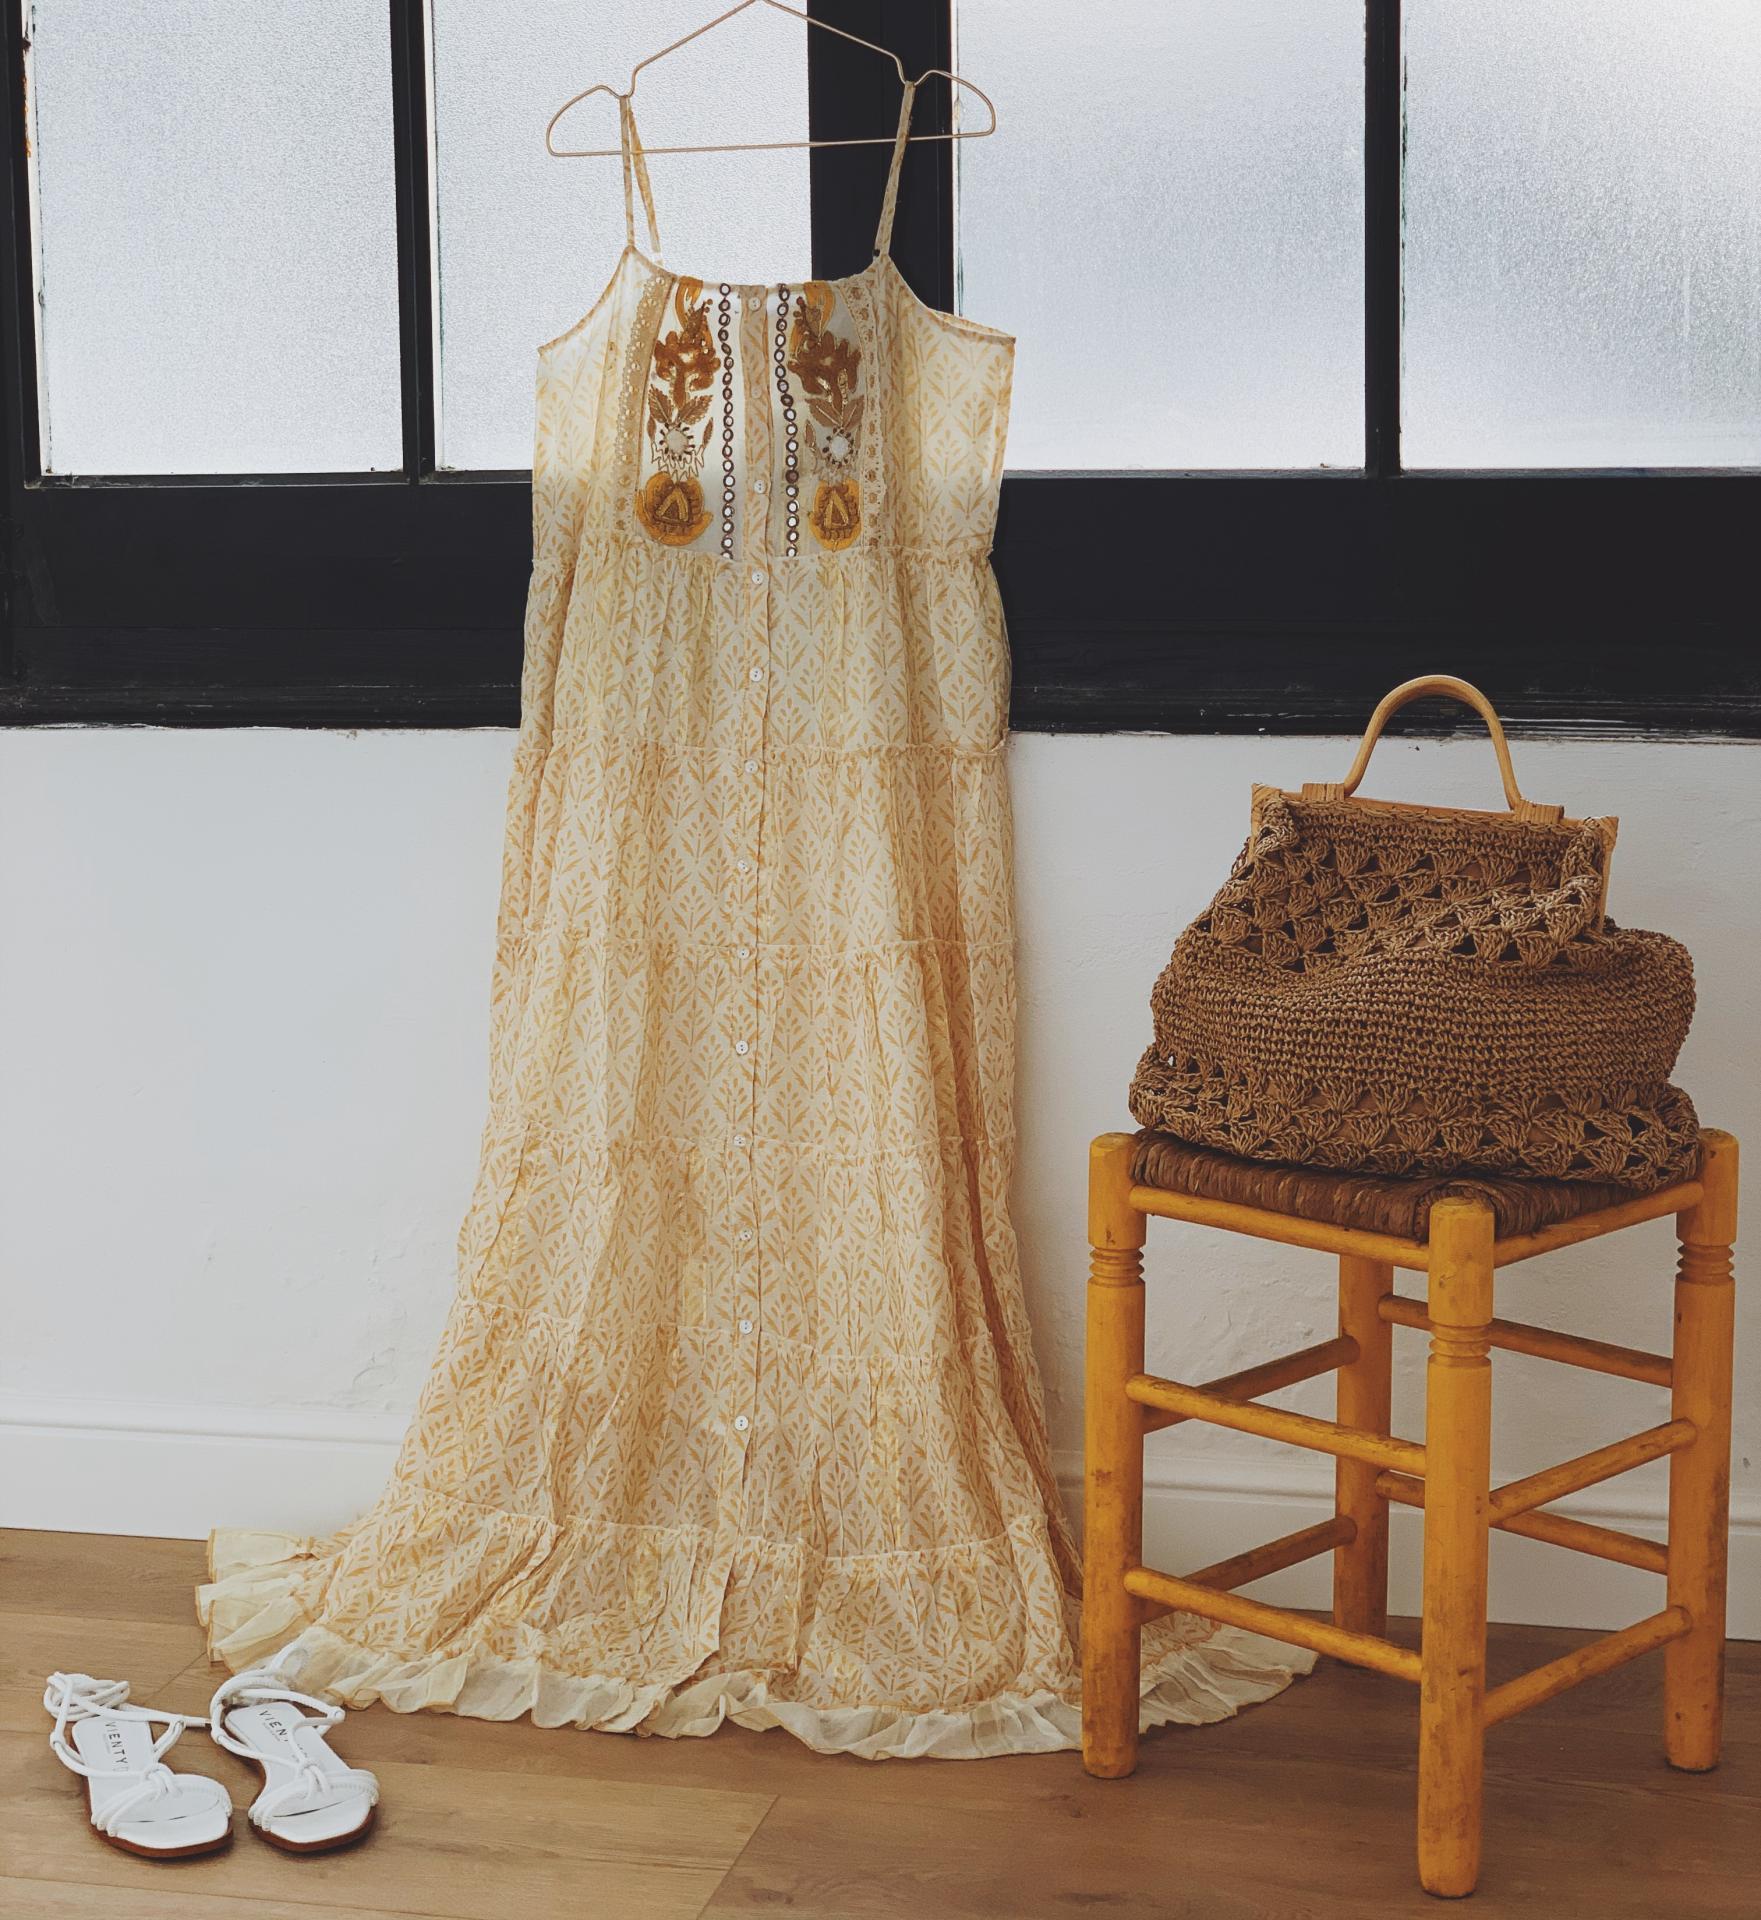 The Yellow Dress (Ref.4113)